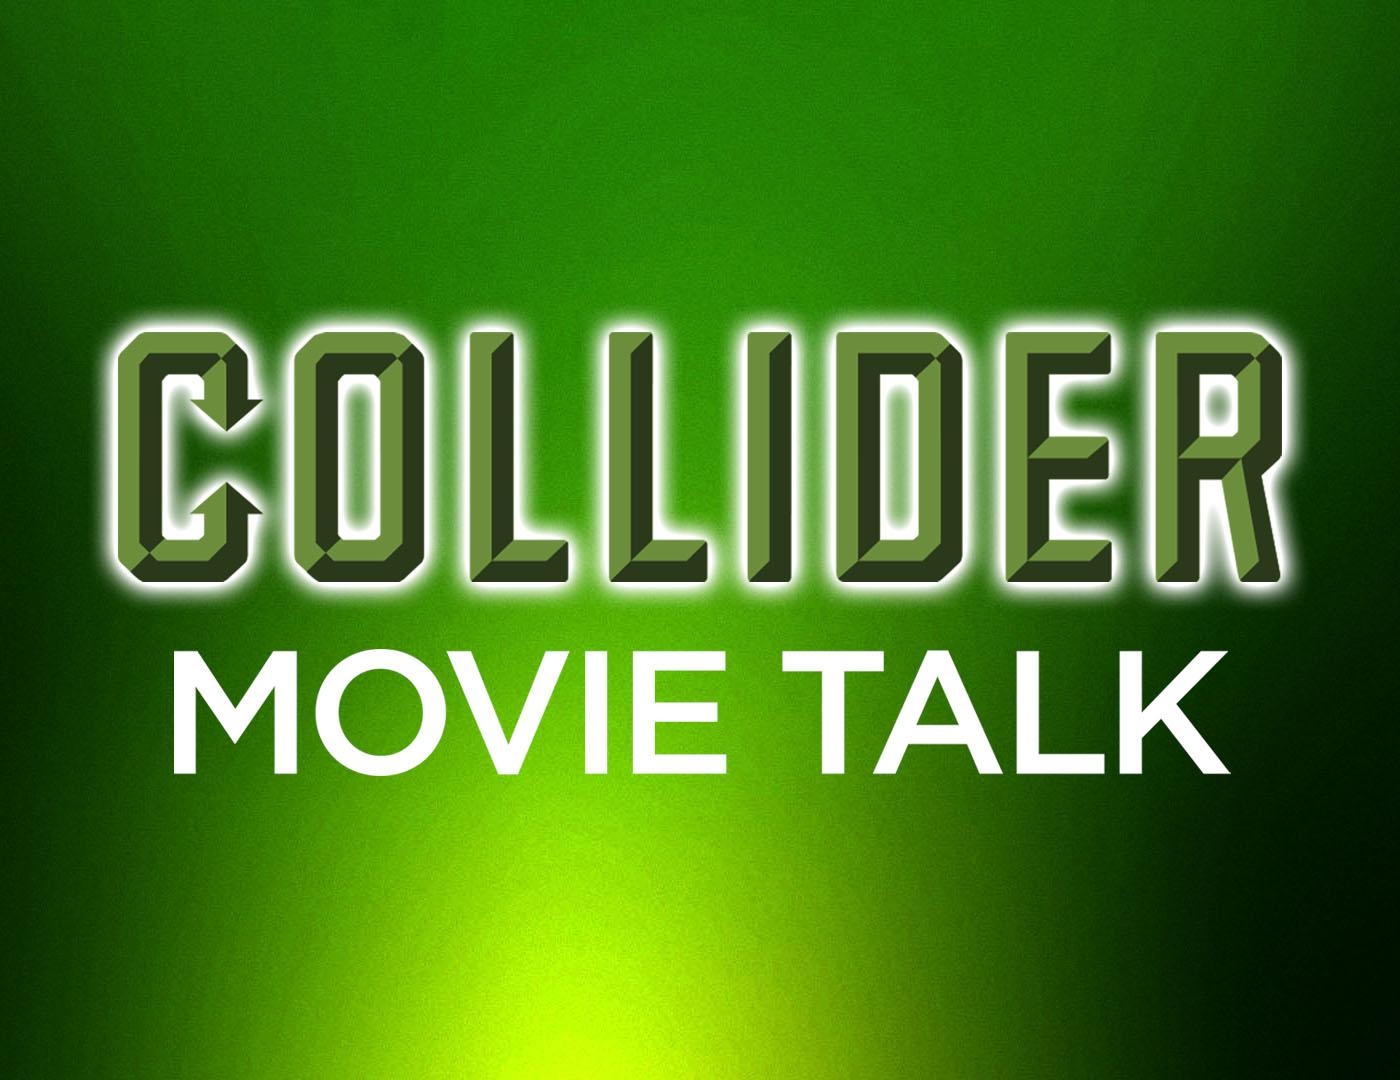 Godzilla and Pacific Rim Sequels Get New Titles - Collider Movie Talk